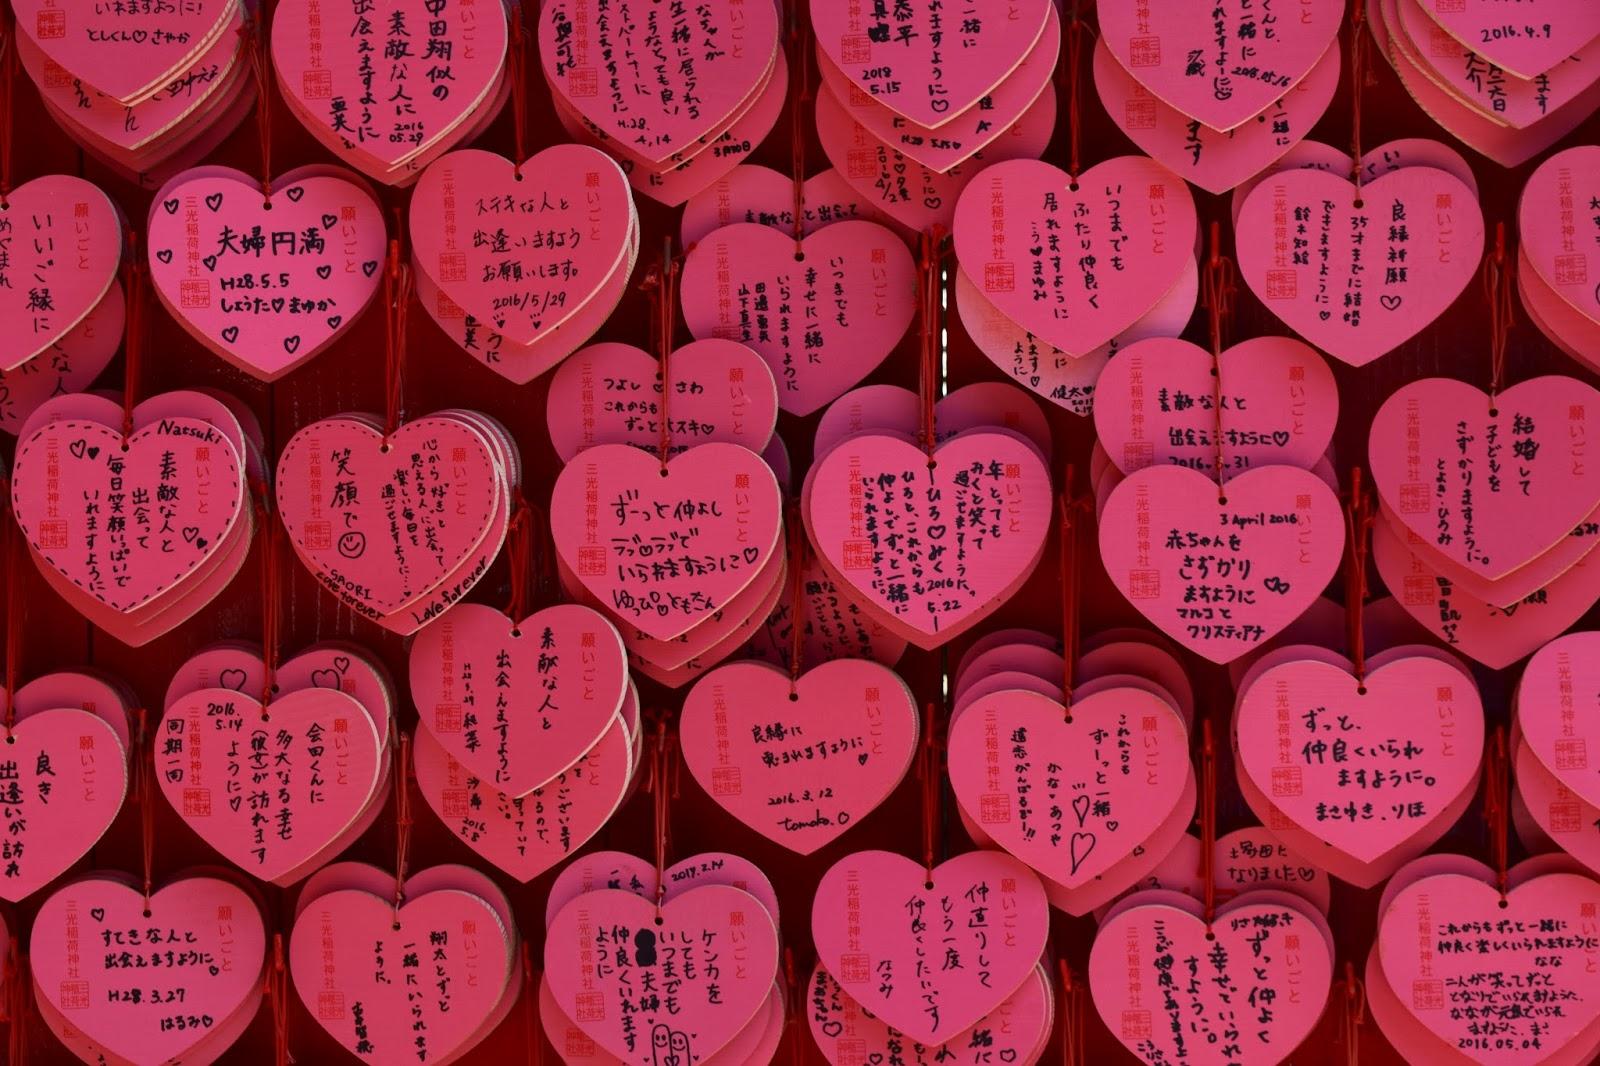 Love heart Ema Japan